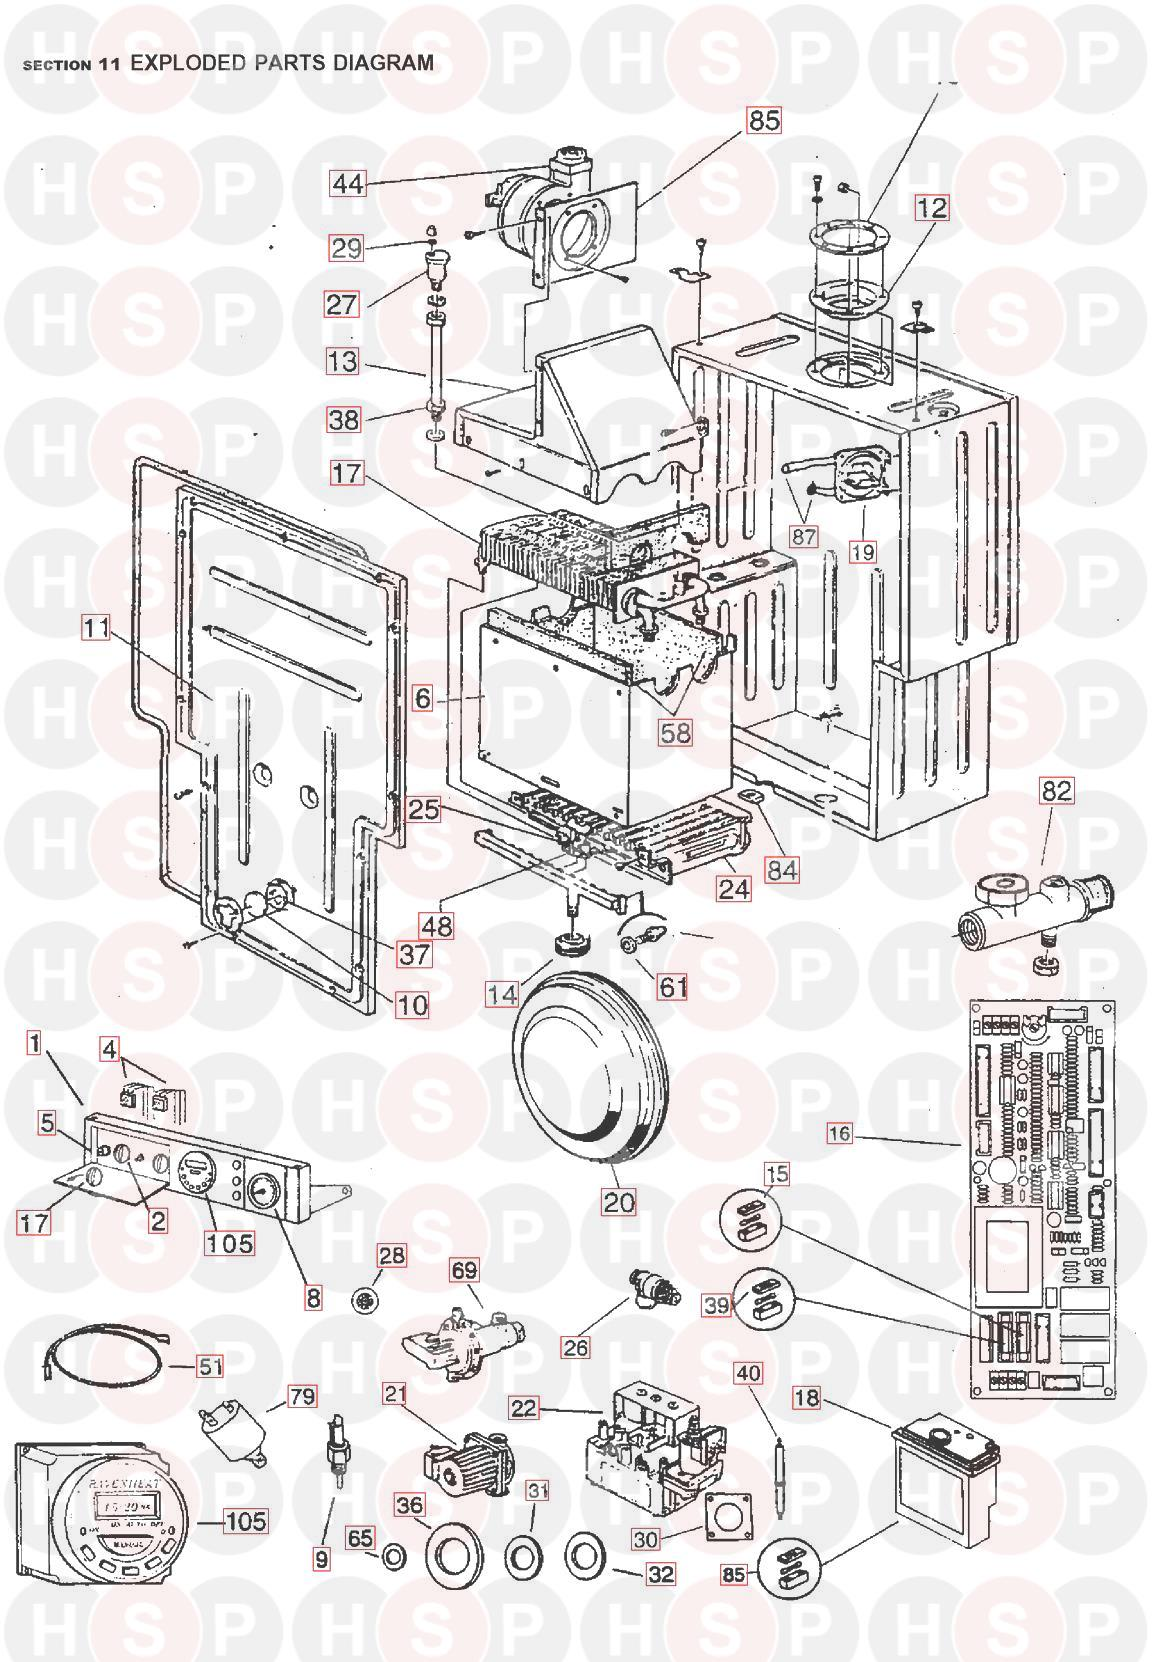 VALVOLA deviatrice RAVENHEAT per RSF 82E 82et 84E 84et 100E /& 100et Deviatore Valvola Rondella 5018030